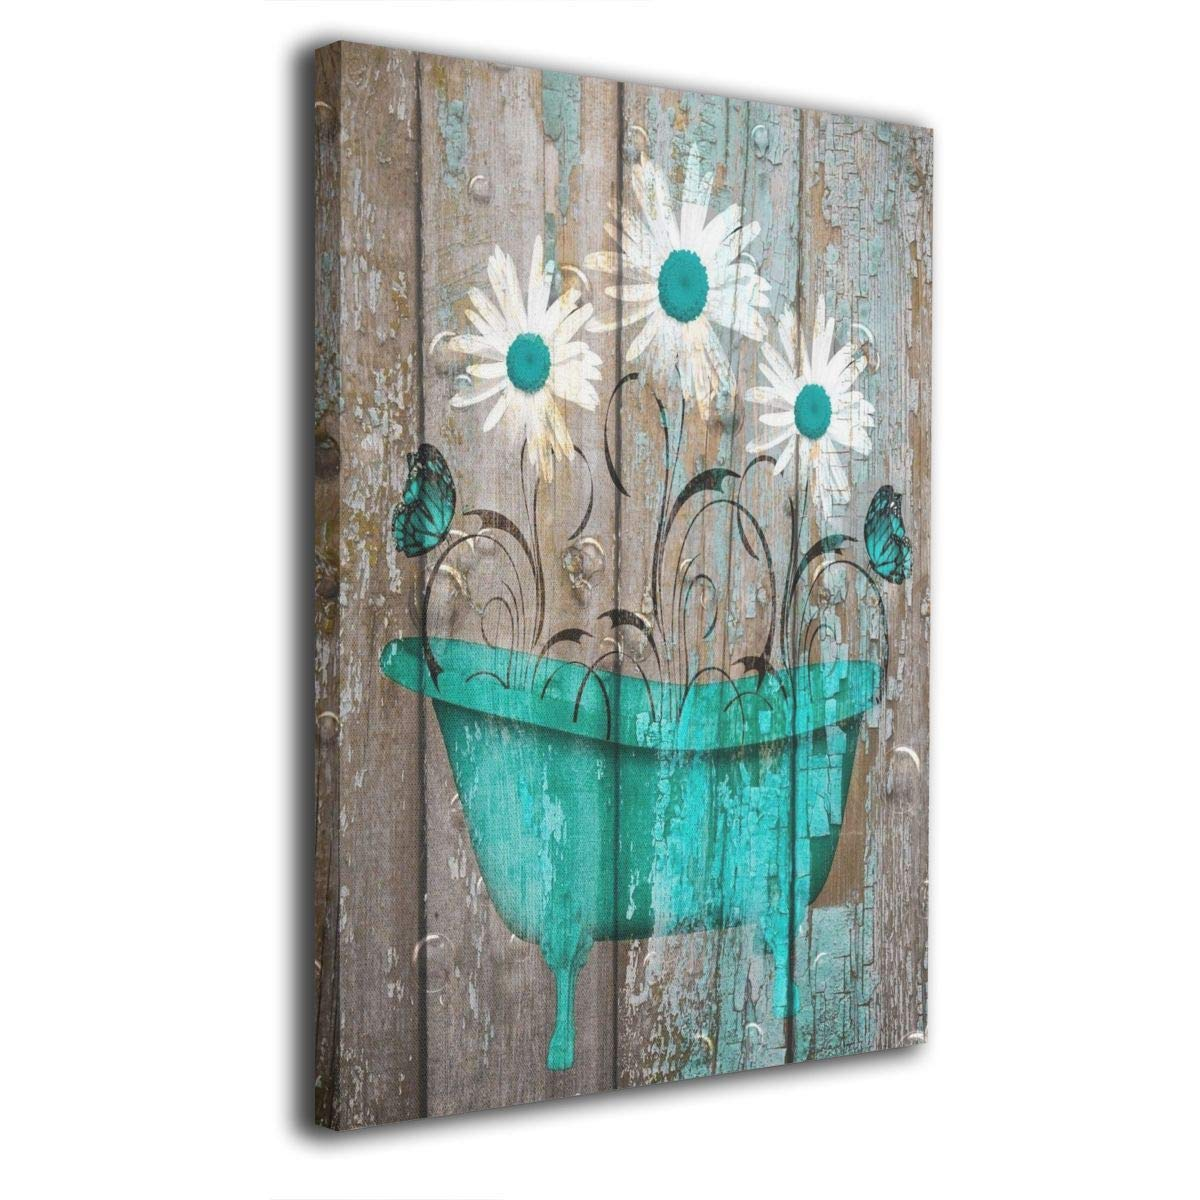 "Okoart Canvas Wall Art Prints Teal White Rustic Flower Bathtub Farmhouse Bathroom Powder Room -Picture Paintings Modern Decorative Giclee Artwork Wall Decor-Wood Frame Gallery Stretched 16""x20"""